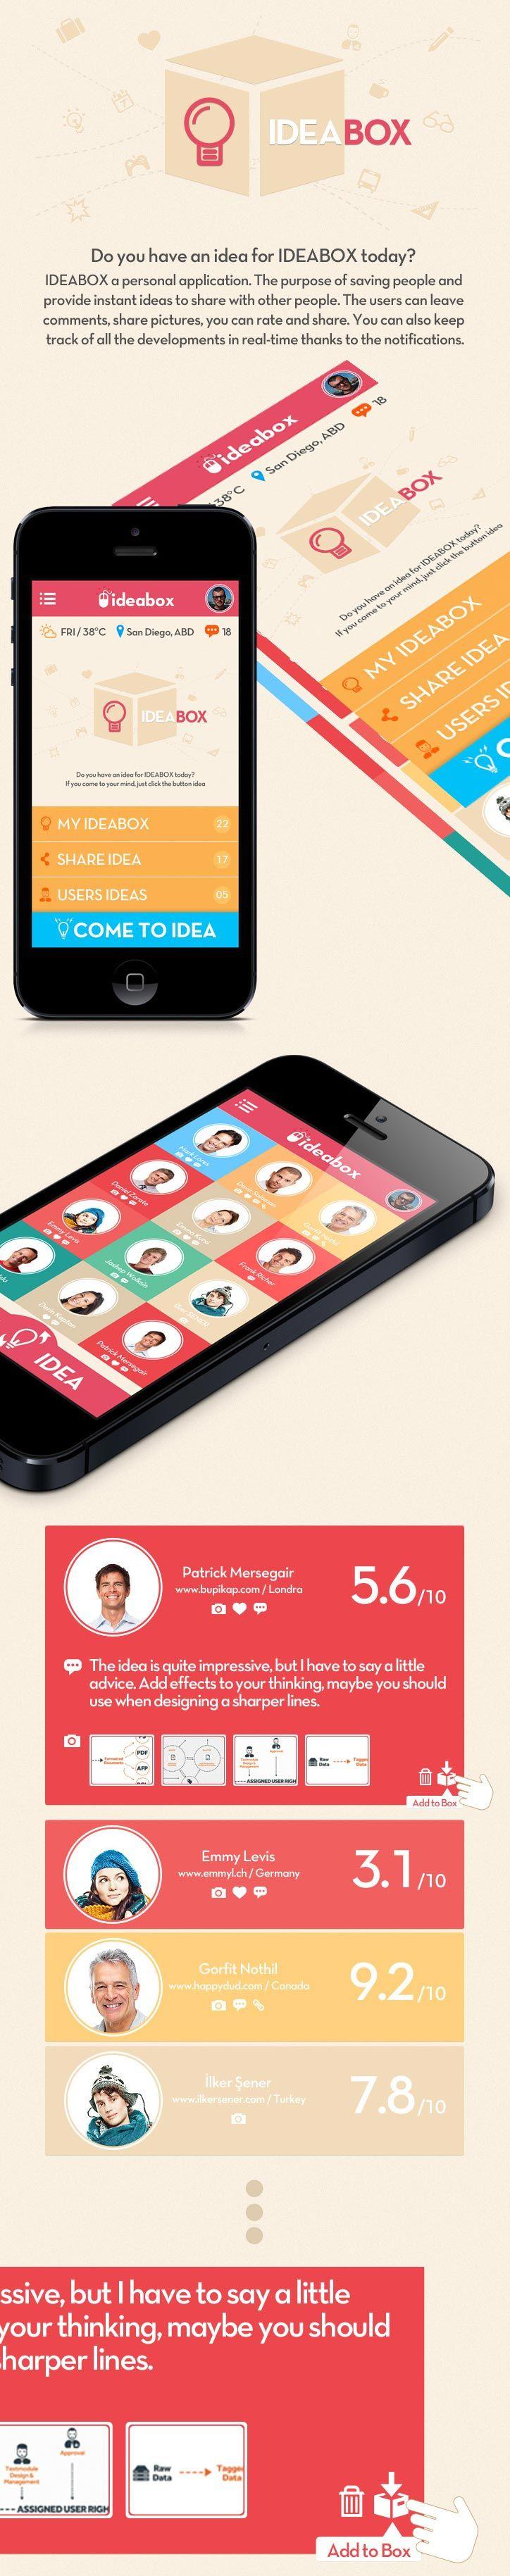 ideabox iPhone App